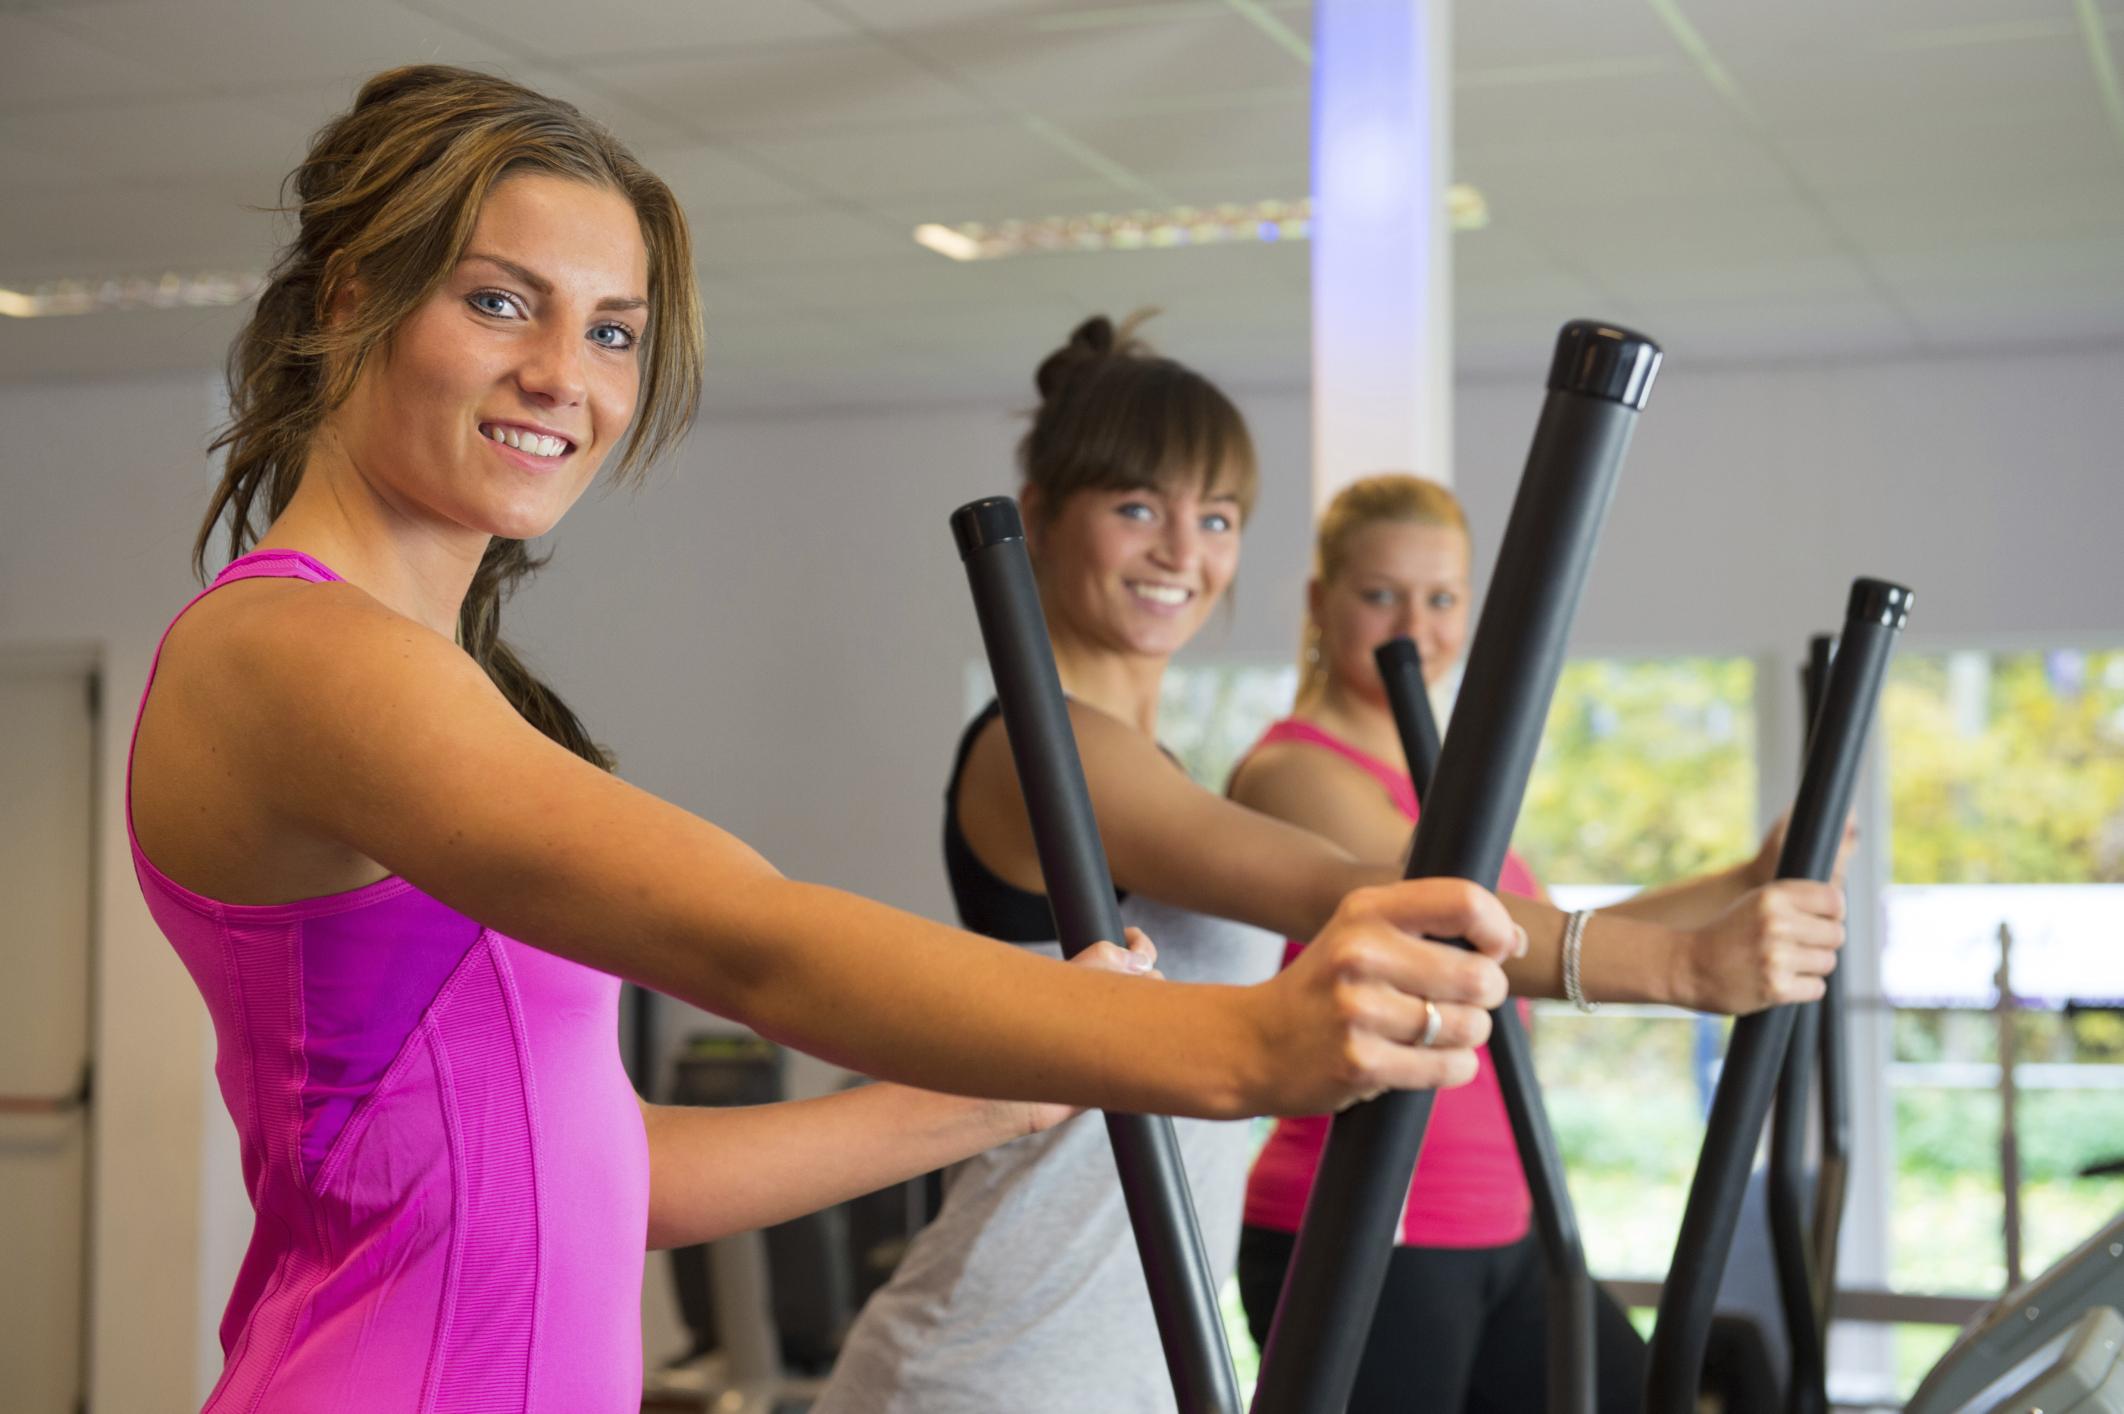 Sportek Ee220 Elliptical Exercise Machine Diet & fitness · 1 decade ago. https www sportsrec com 356298 sportek ee220 elliptical exercise machine html